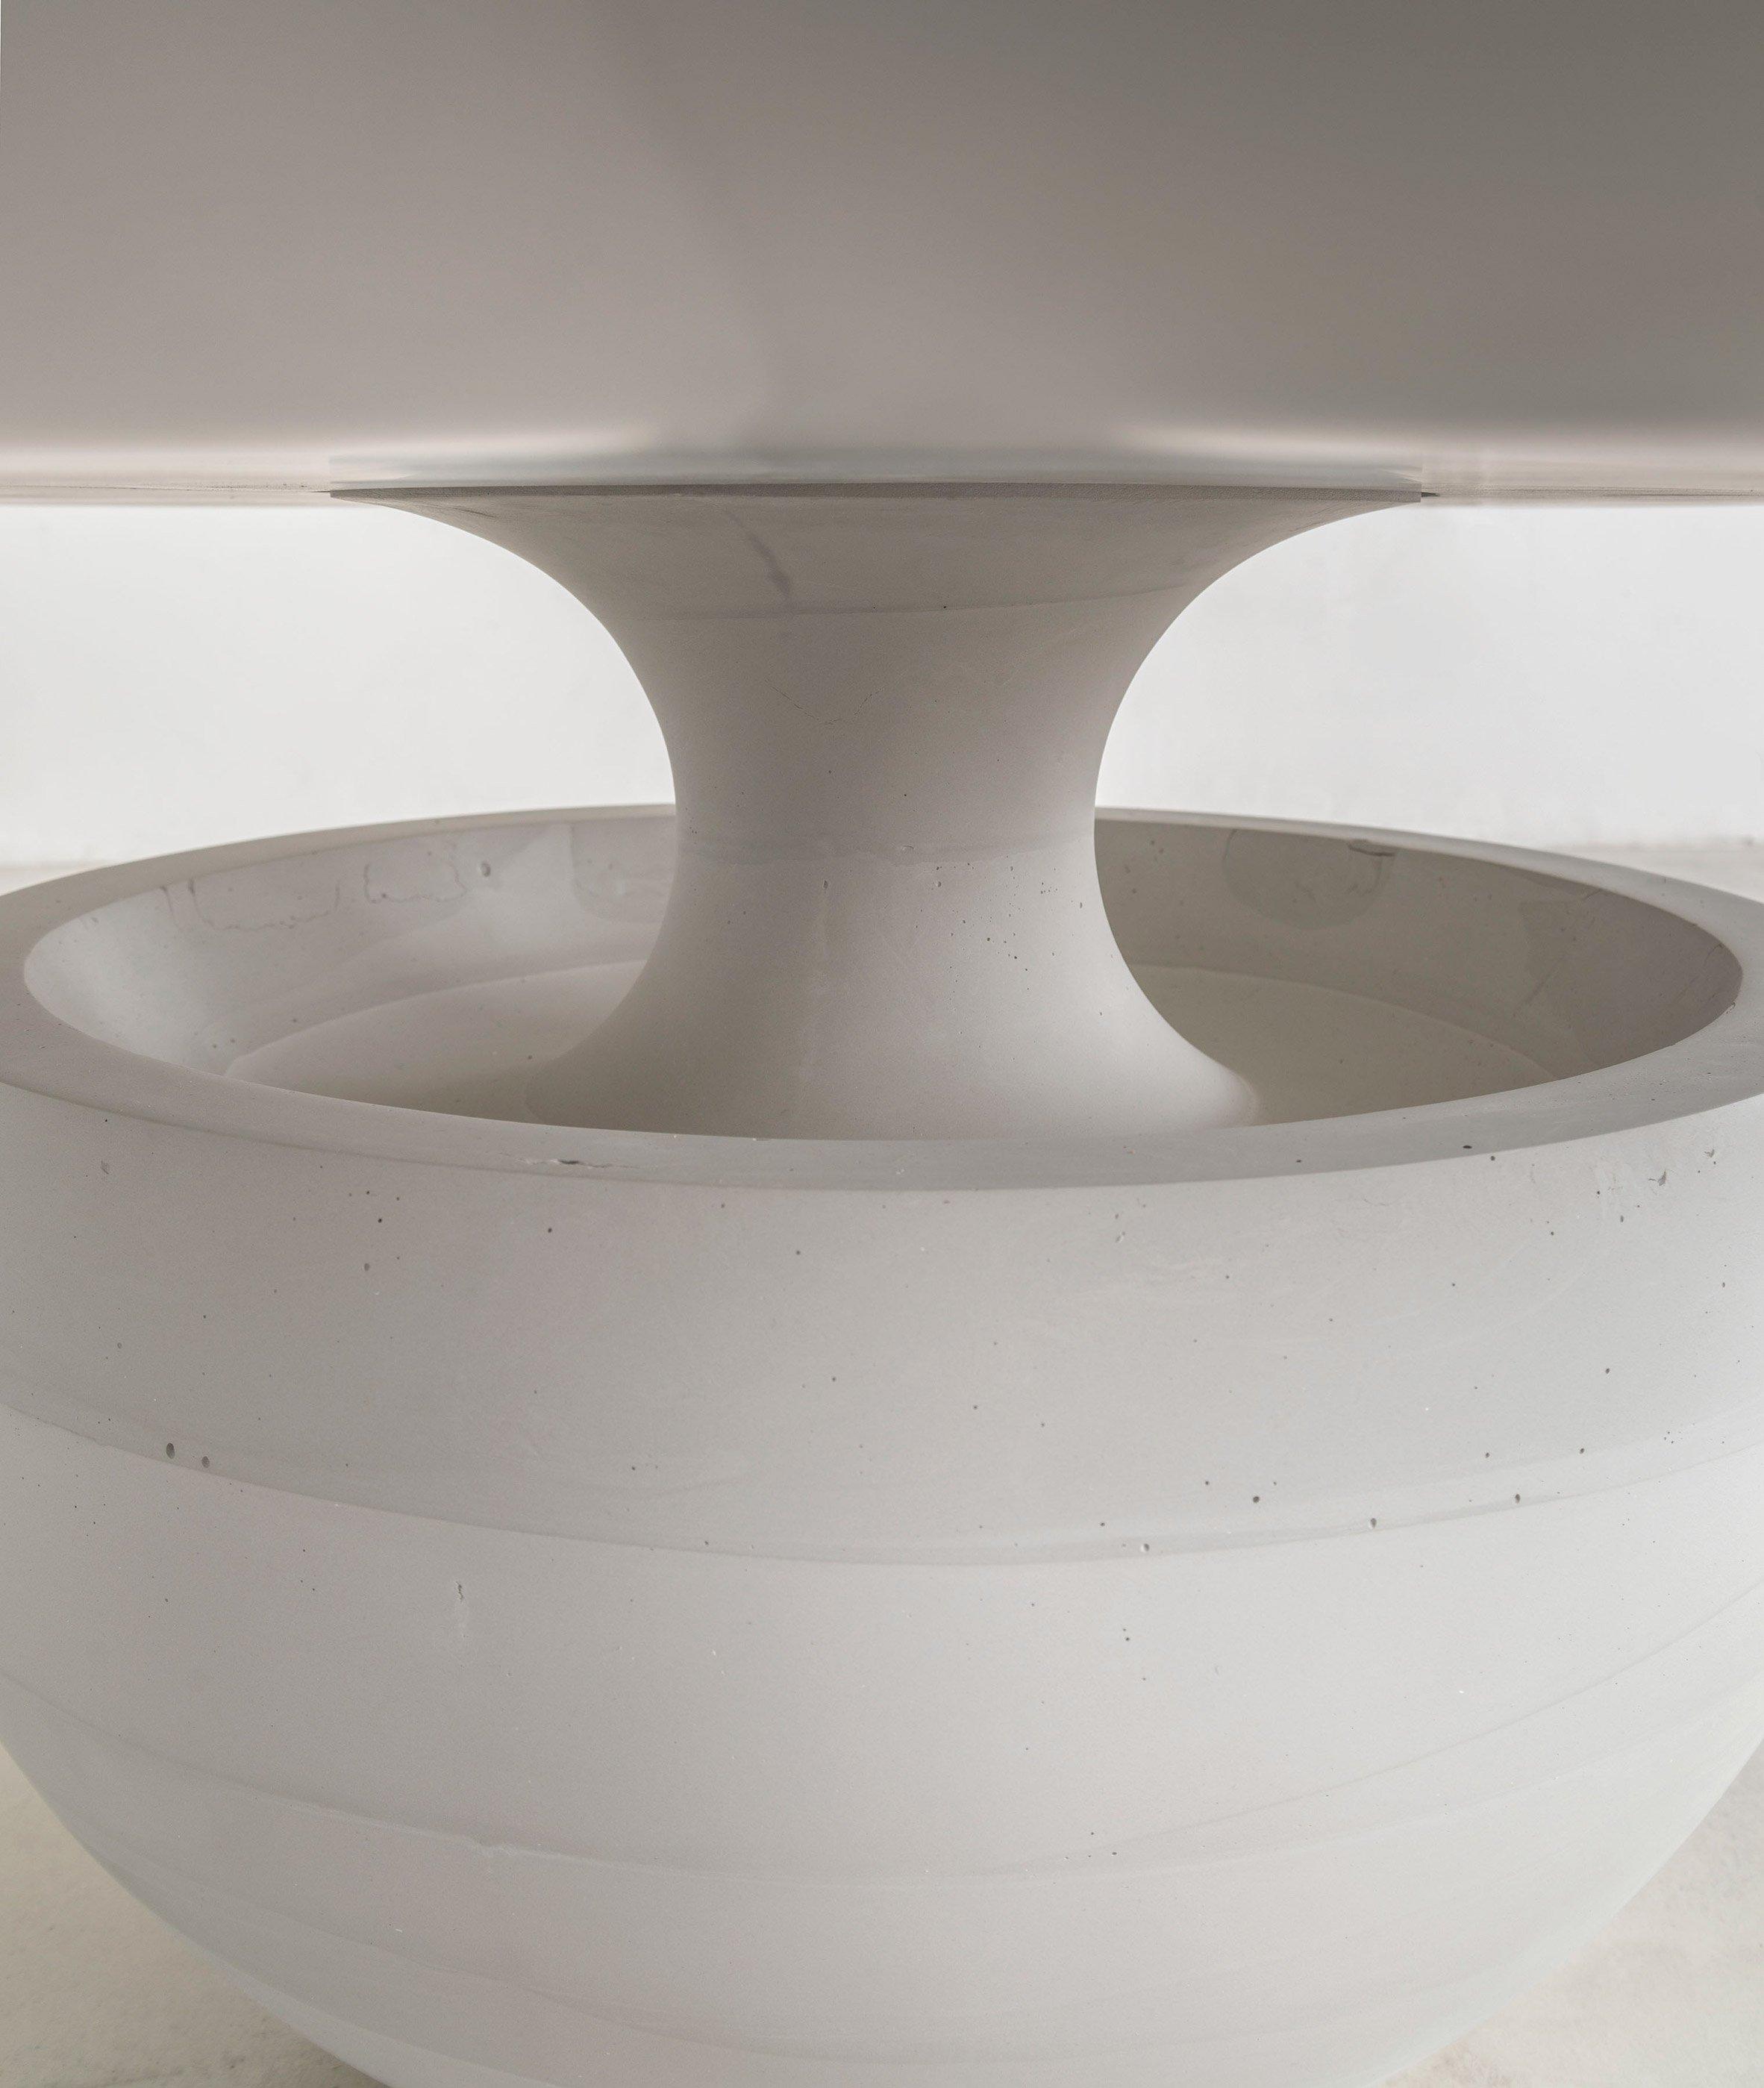 ghost-thaw-furniture-fernando-mastrangelo-collection-new-york-cast_dezeen_2364_col_18